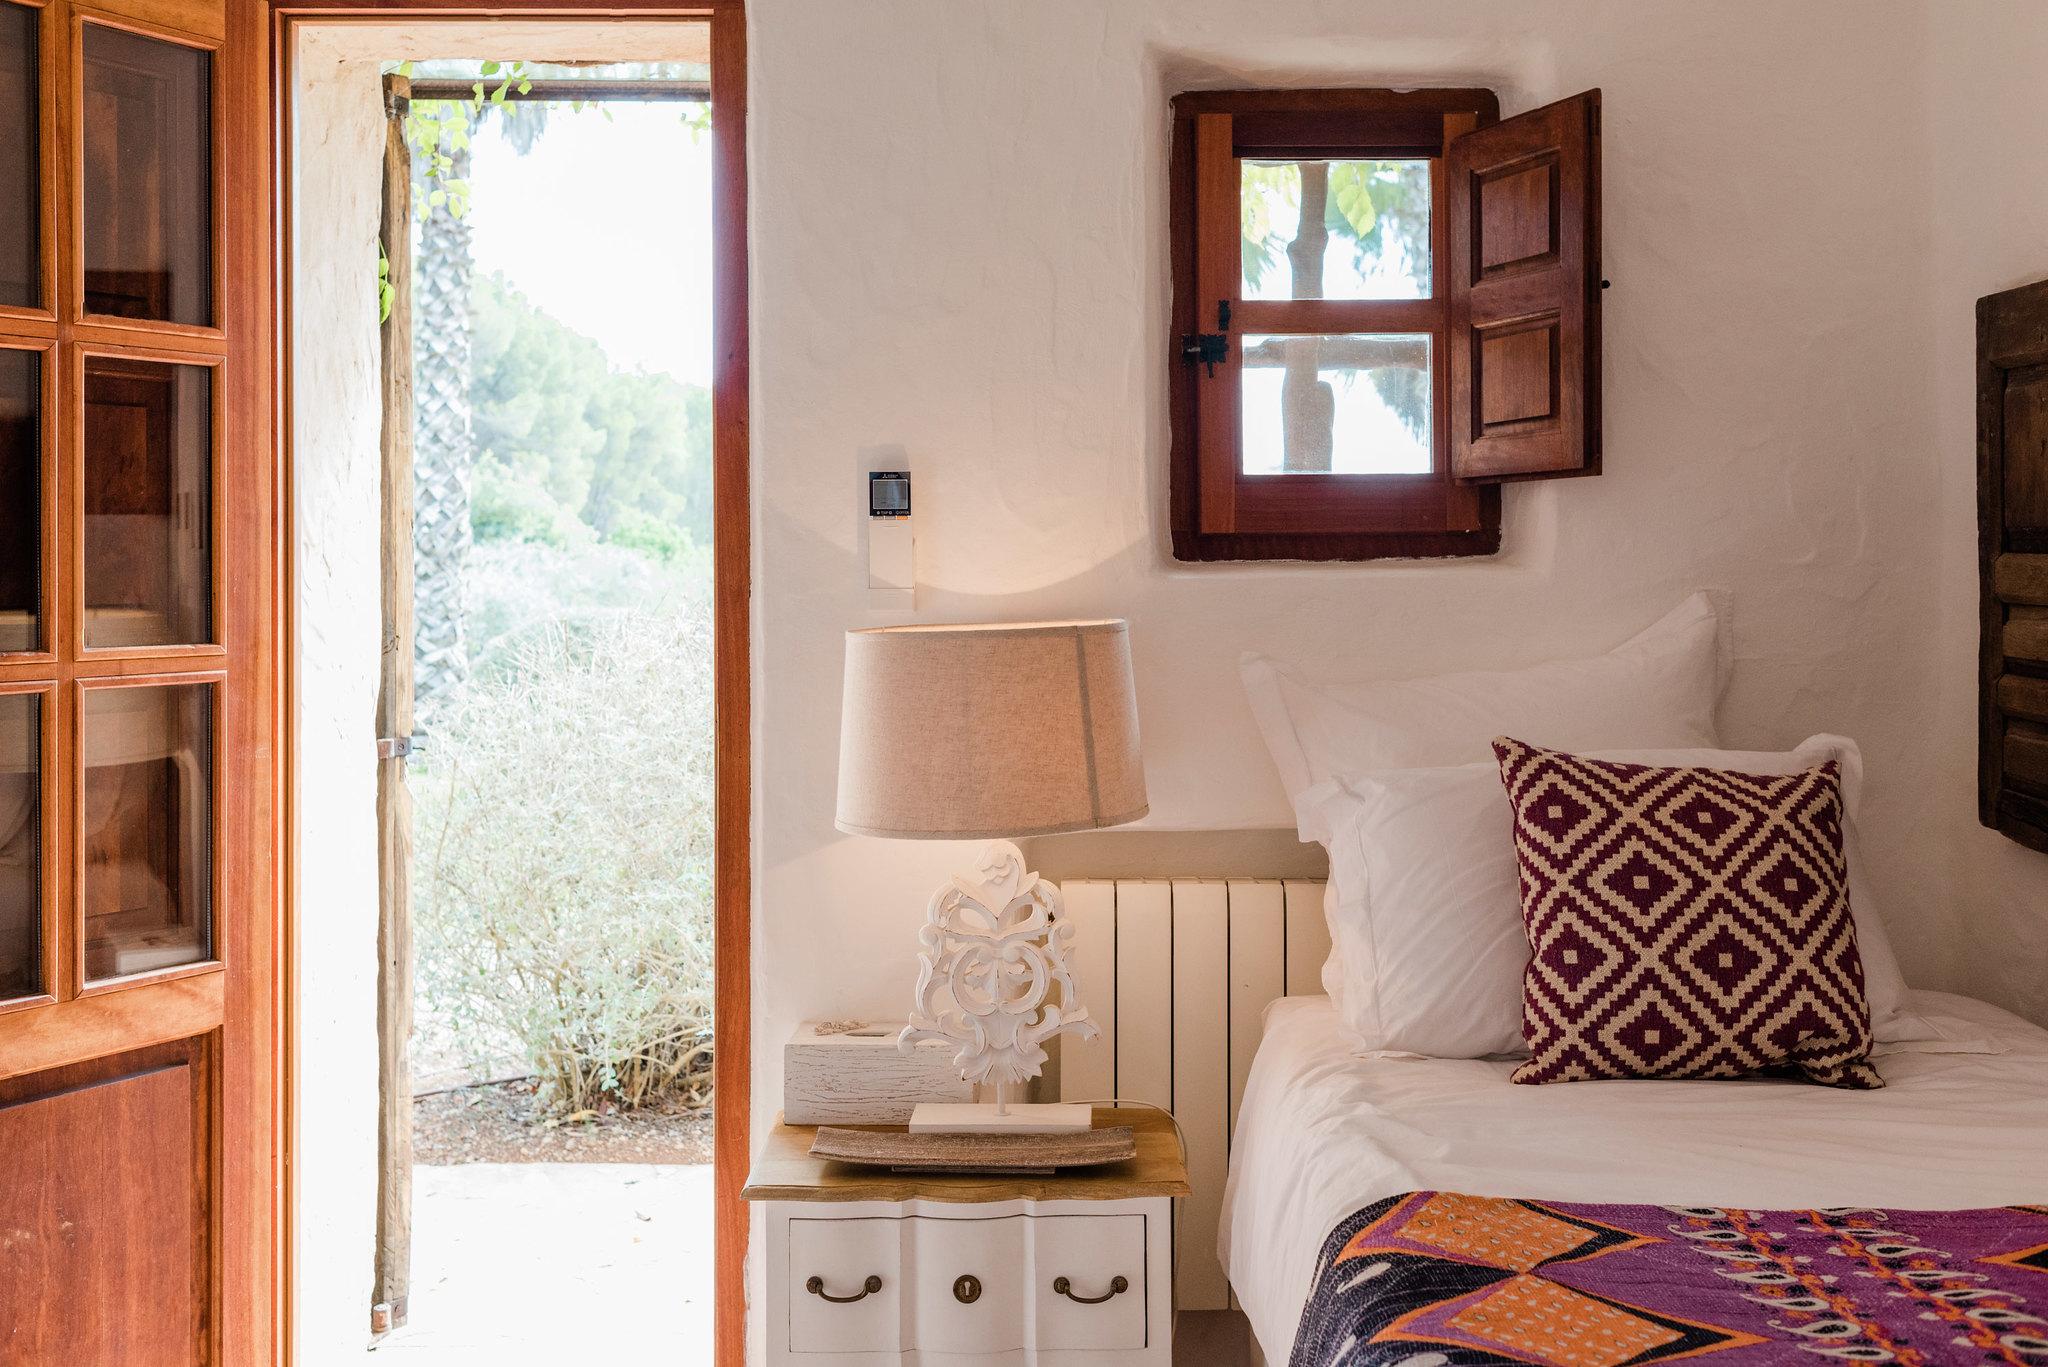 https://www.white-ibiza.com/wp-content/uploads/2020/05/white-ibiza-villas-can-sabina-interior-bedroom2.jpg